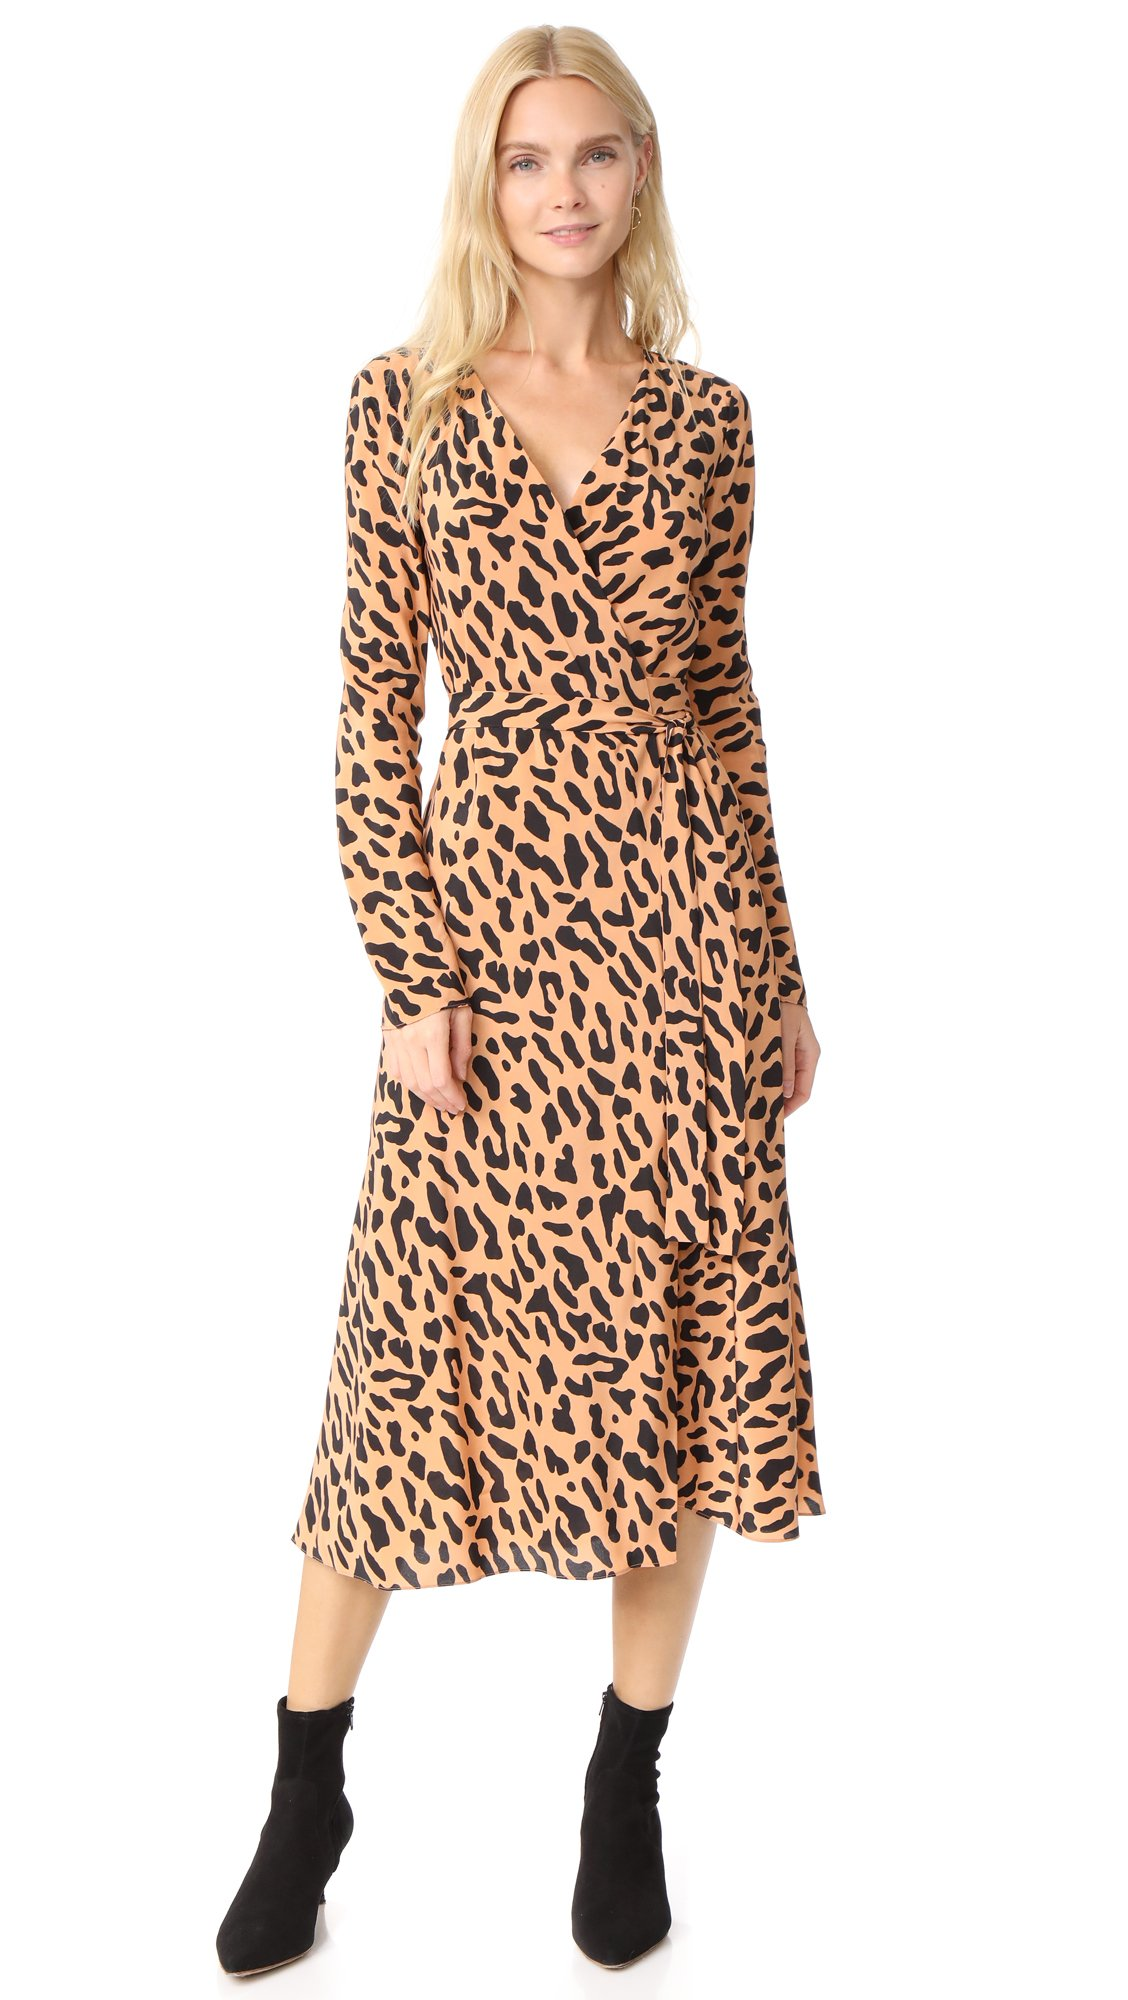 Diane von Furstenberg Women's L / S Woven Wrap Dress, Belmont Camel, 4